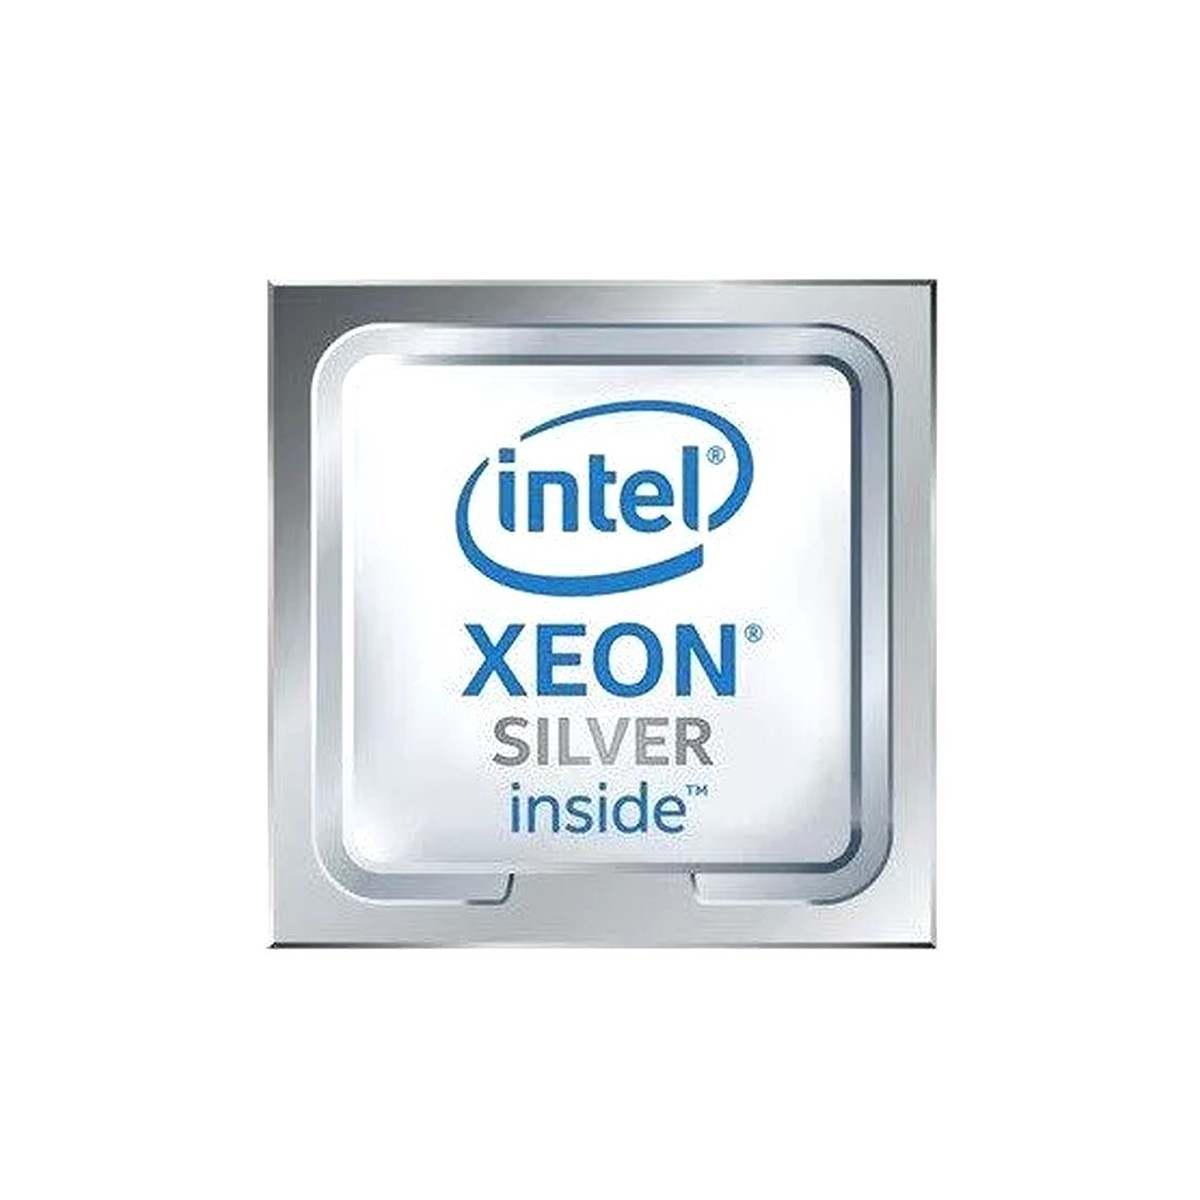 DELL T5810 QC E5v3 32GB DDR4 1TB 256SSD K4200 W10